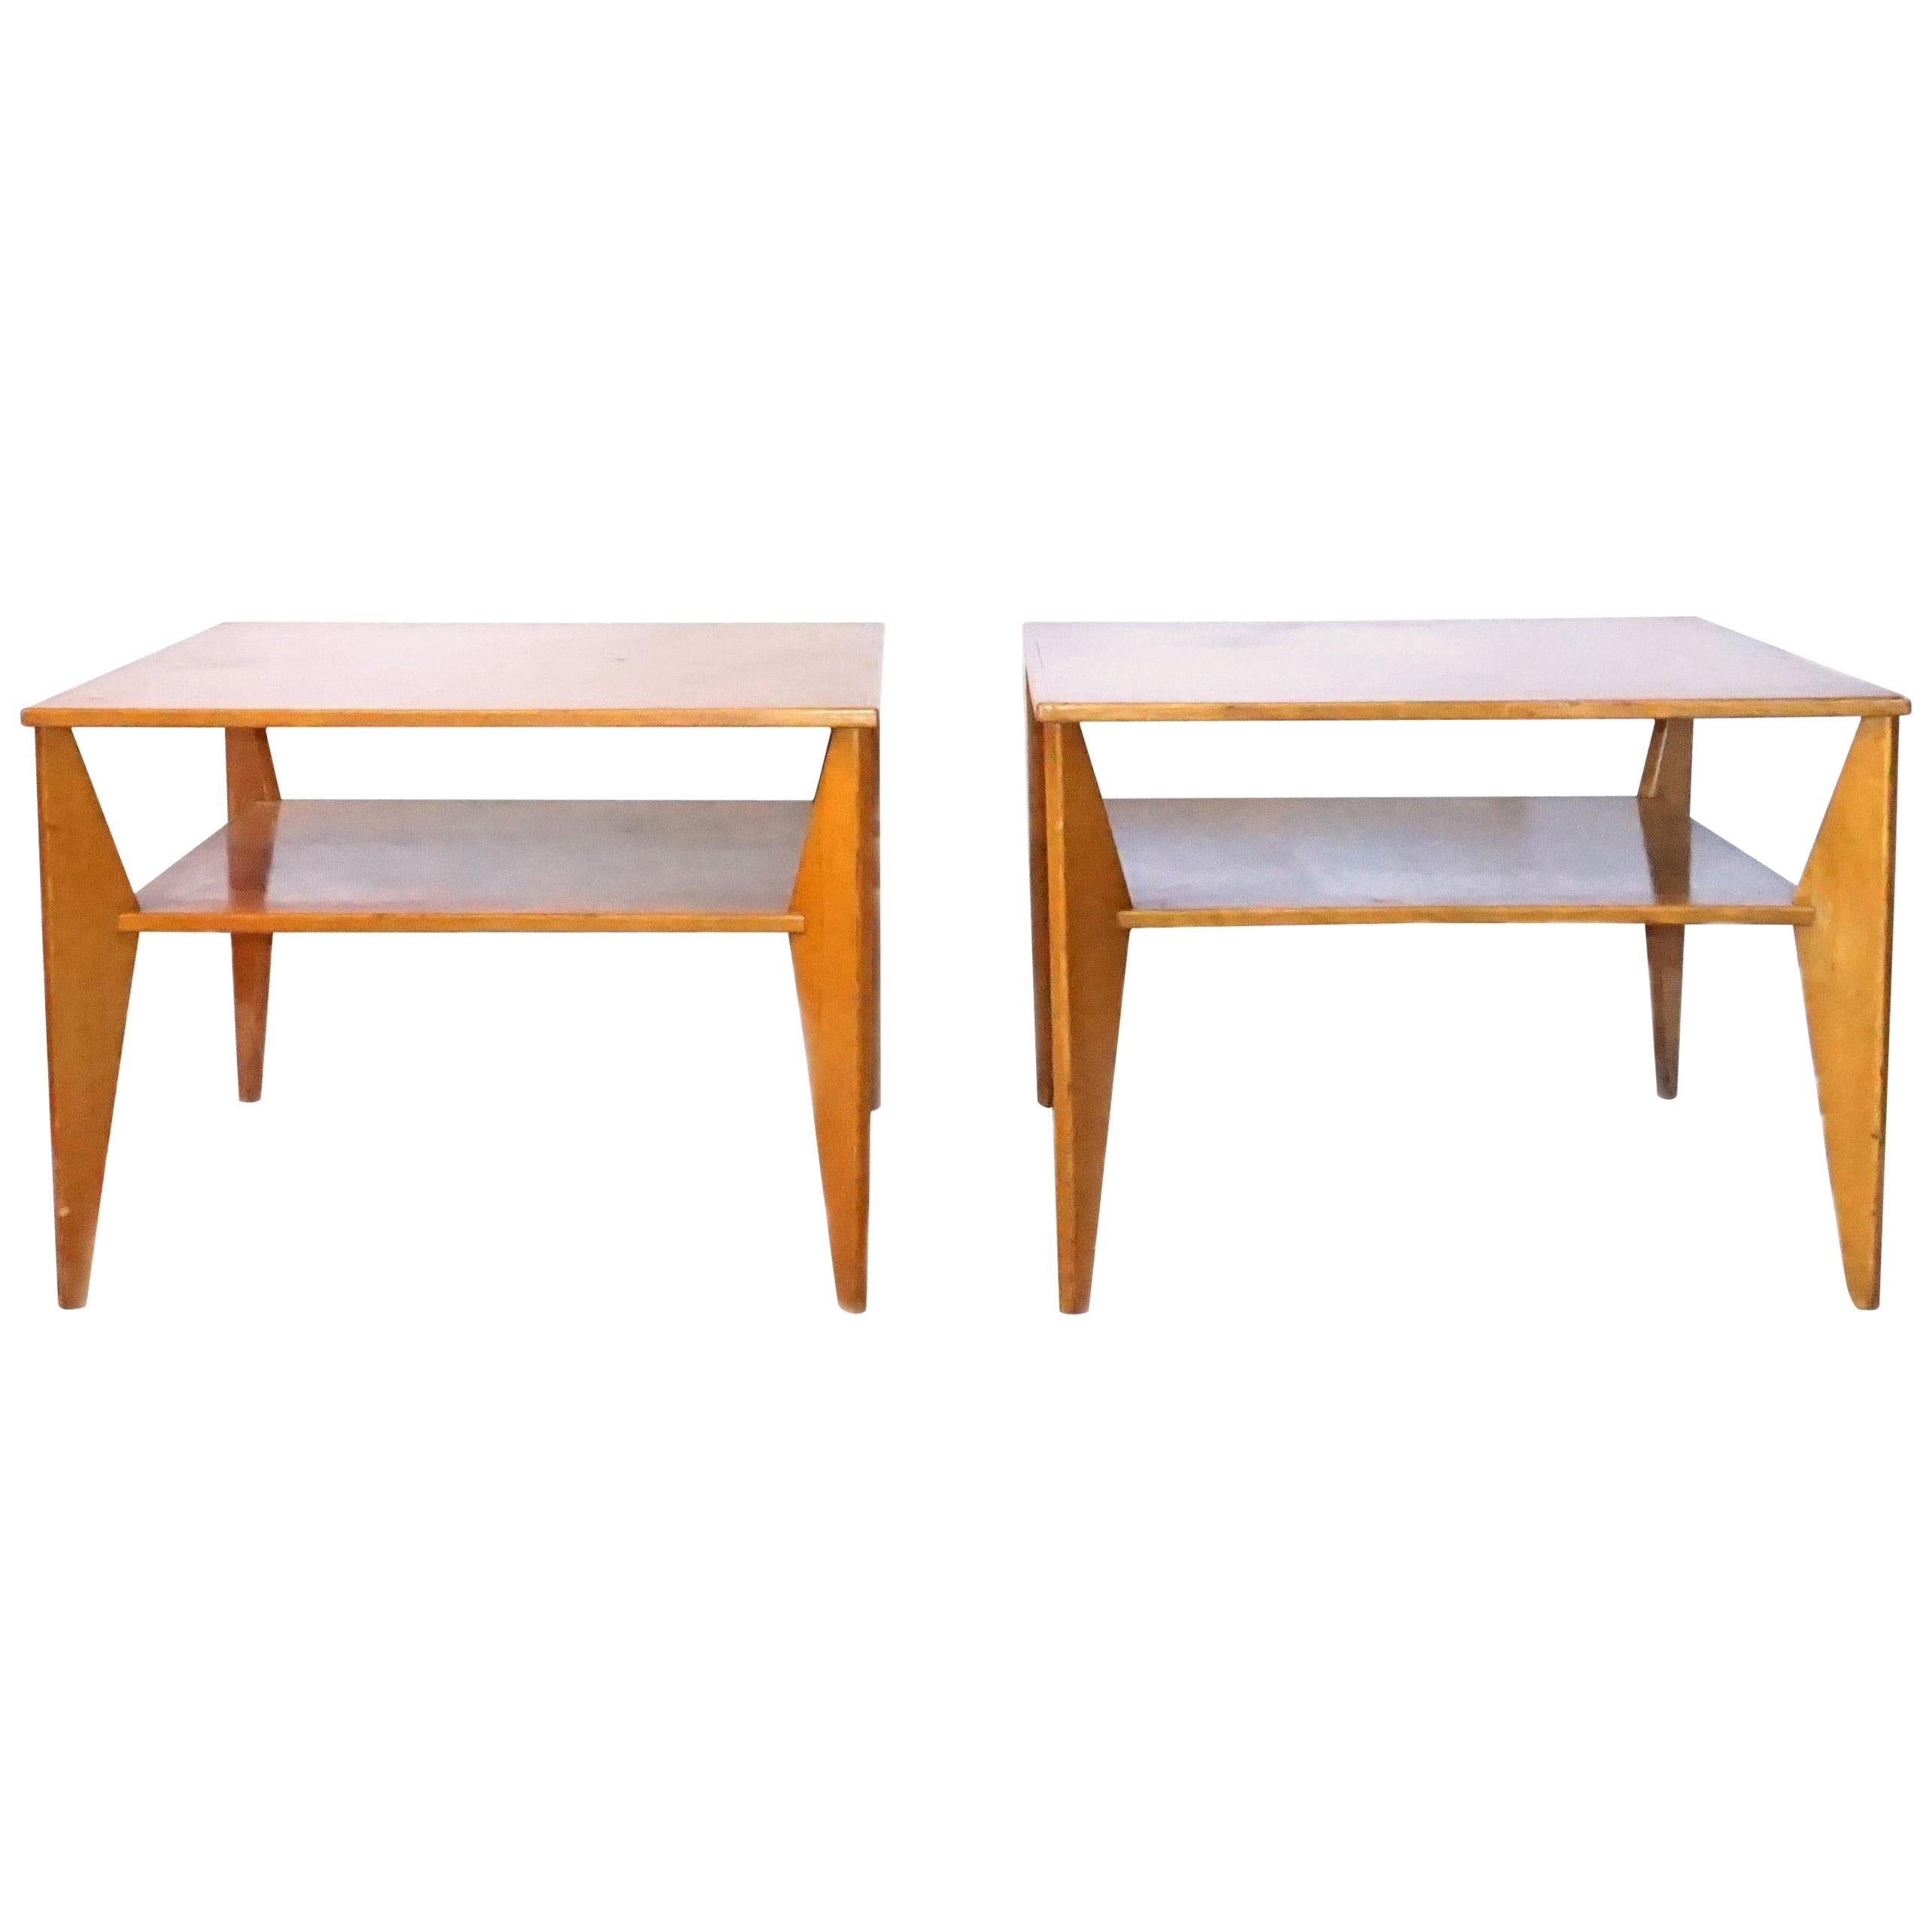 20th Century Swedish Pair of Two Tiers, Veneered Wood Side Tables